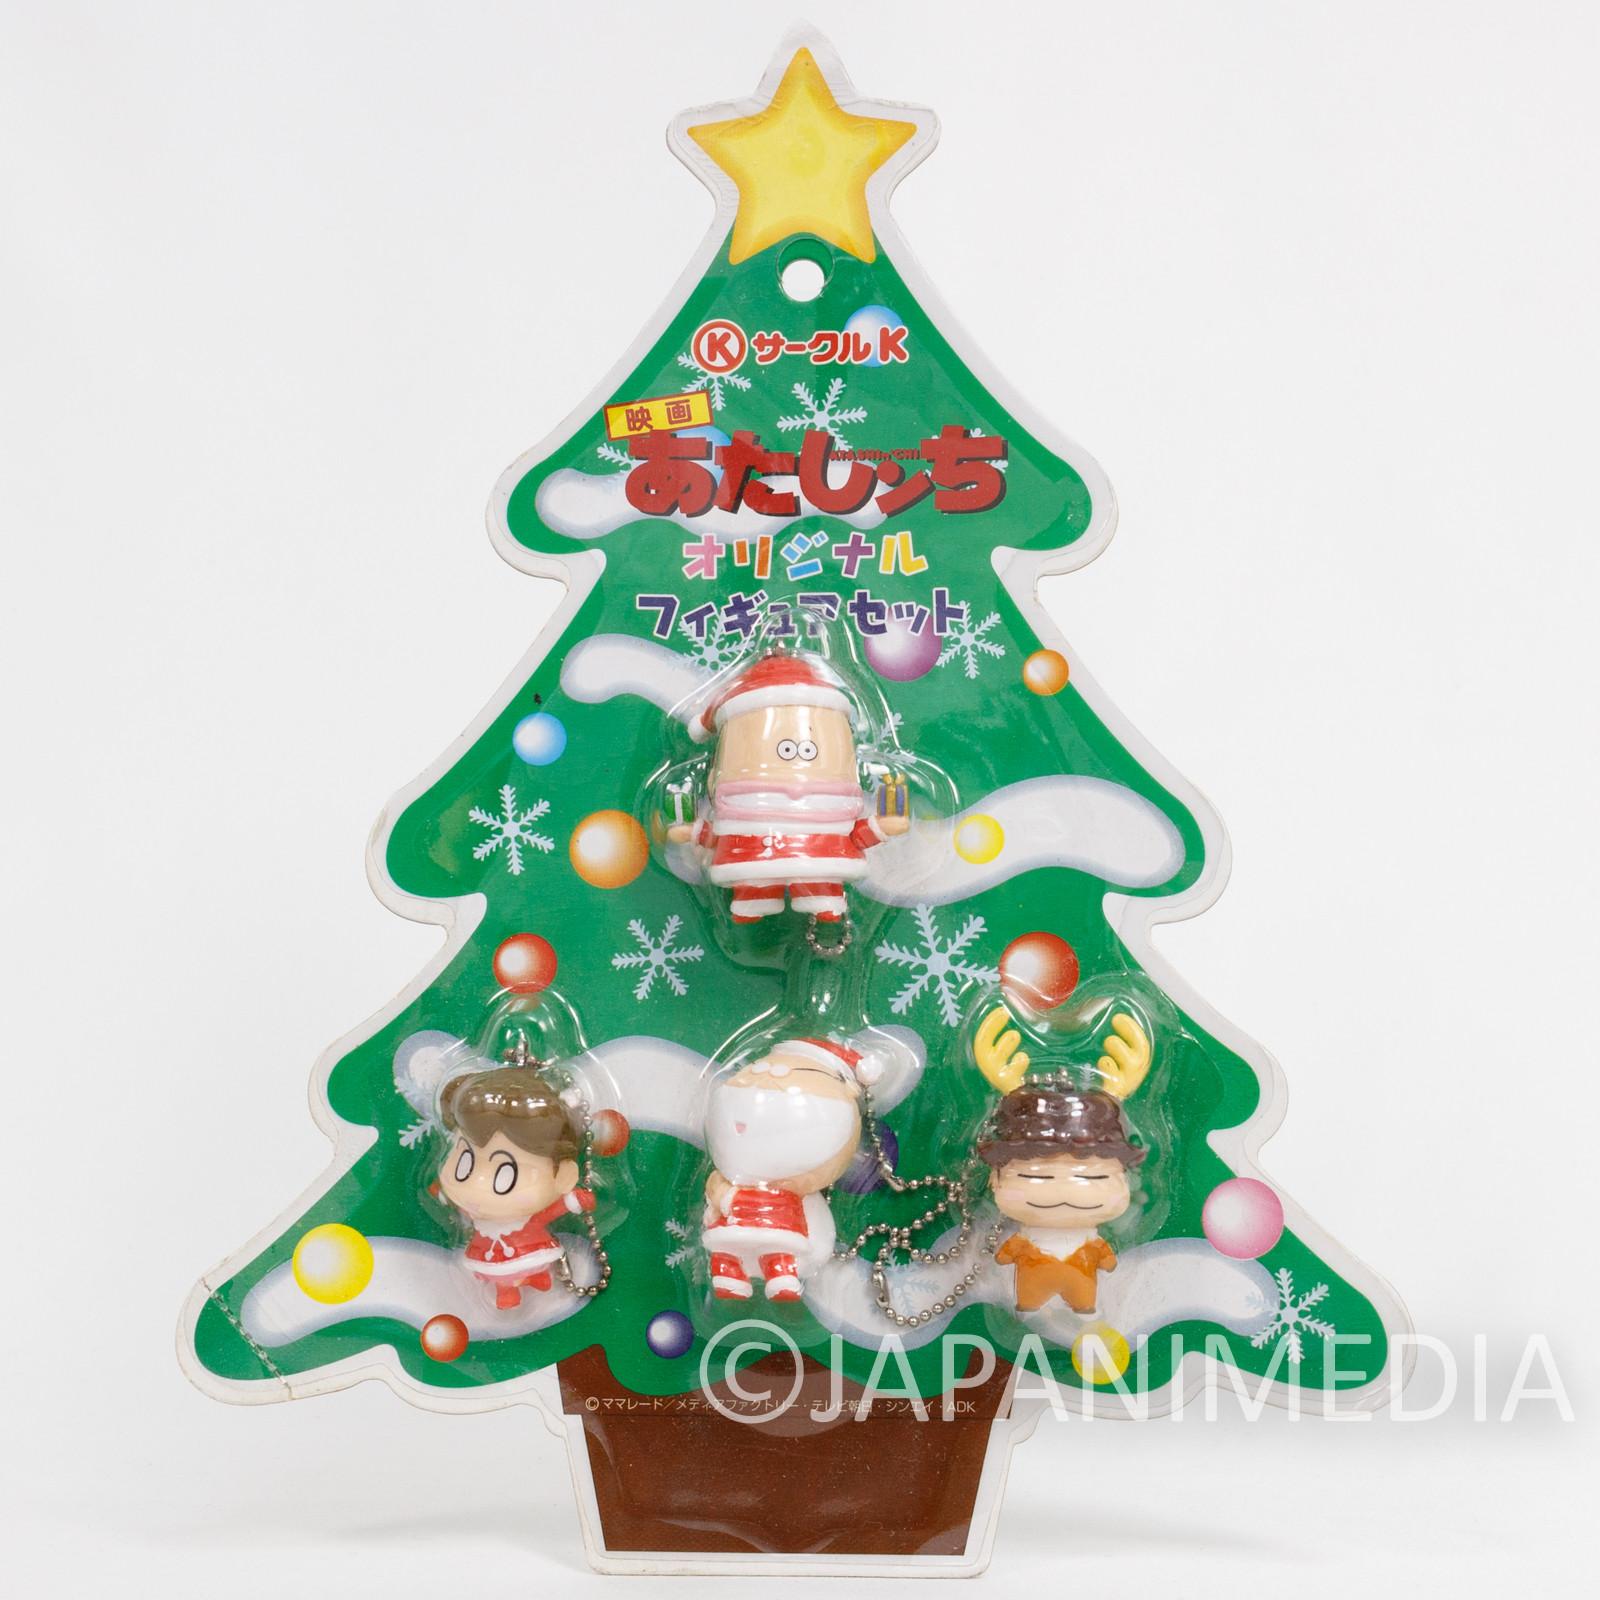 Atashin'chi Christmas Tree Santa Figure Ballchain JAPAN ANIME MANGA